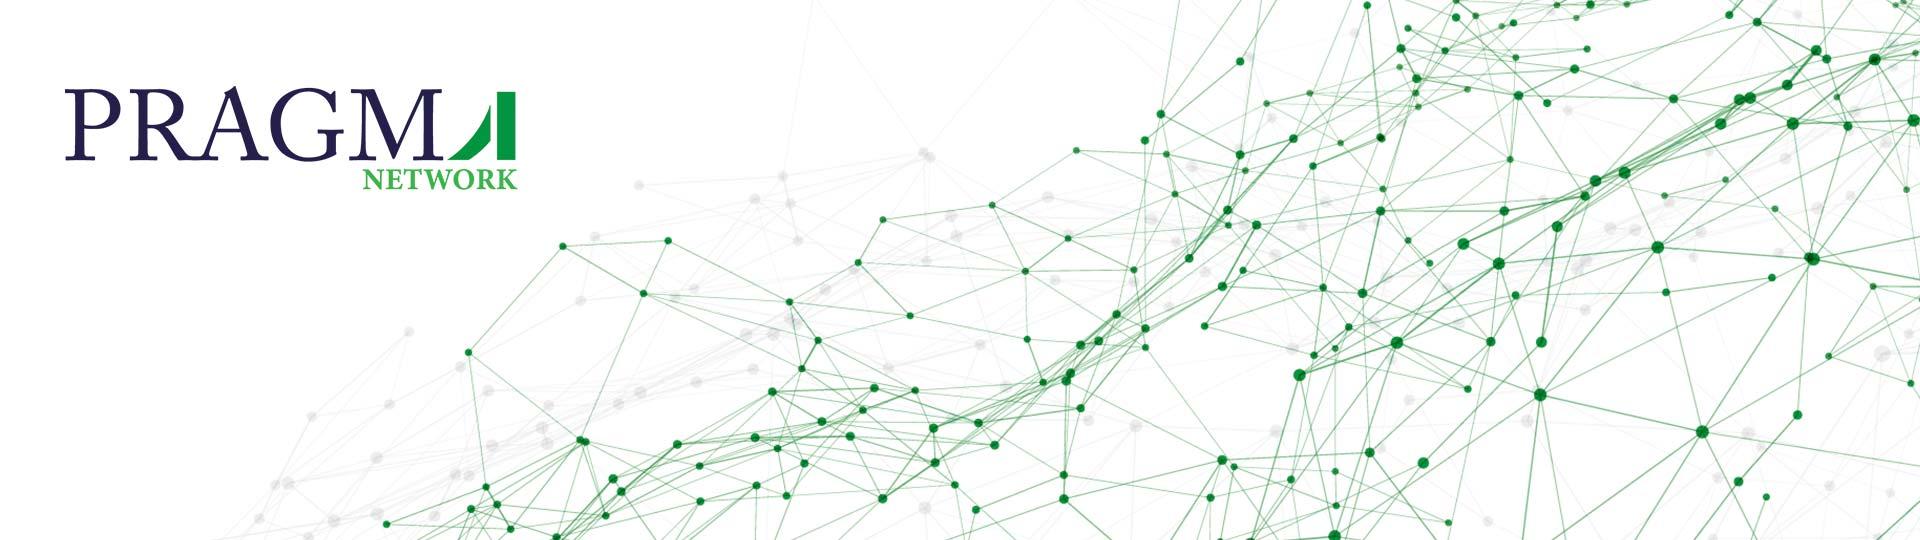 Pragma Network